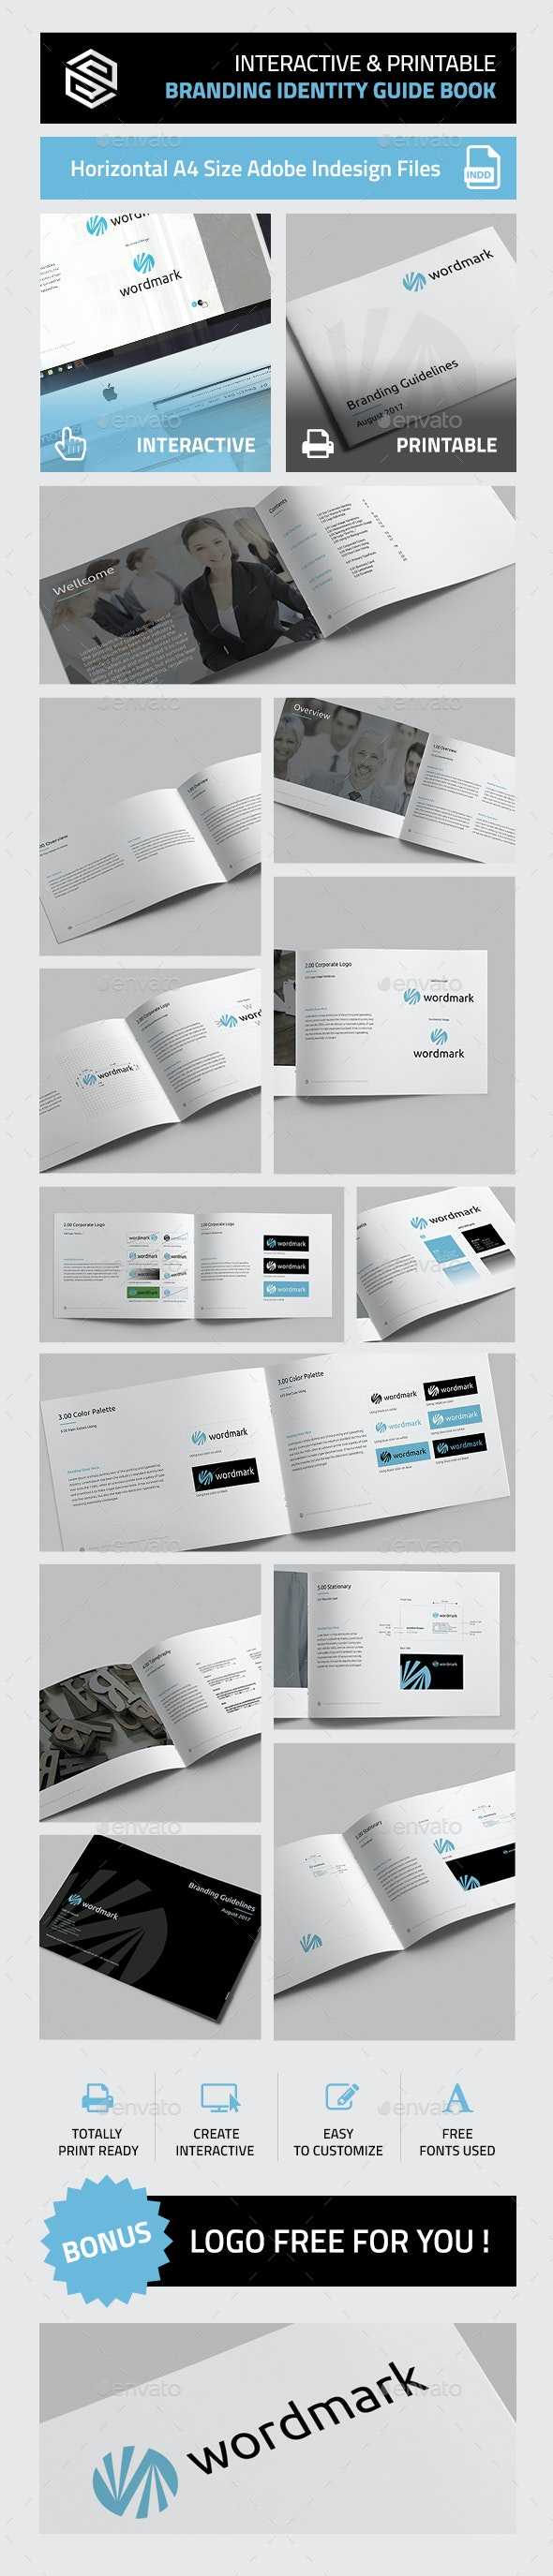 Interactive & Printable Branding Identity Guidelines Book - Corporate Brochures